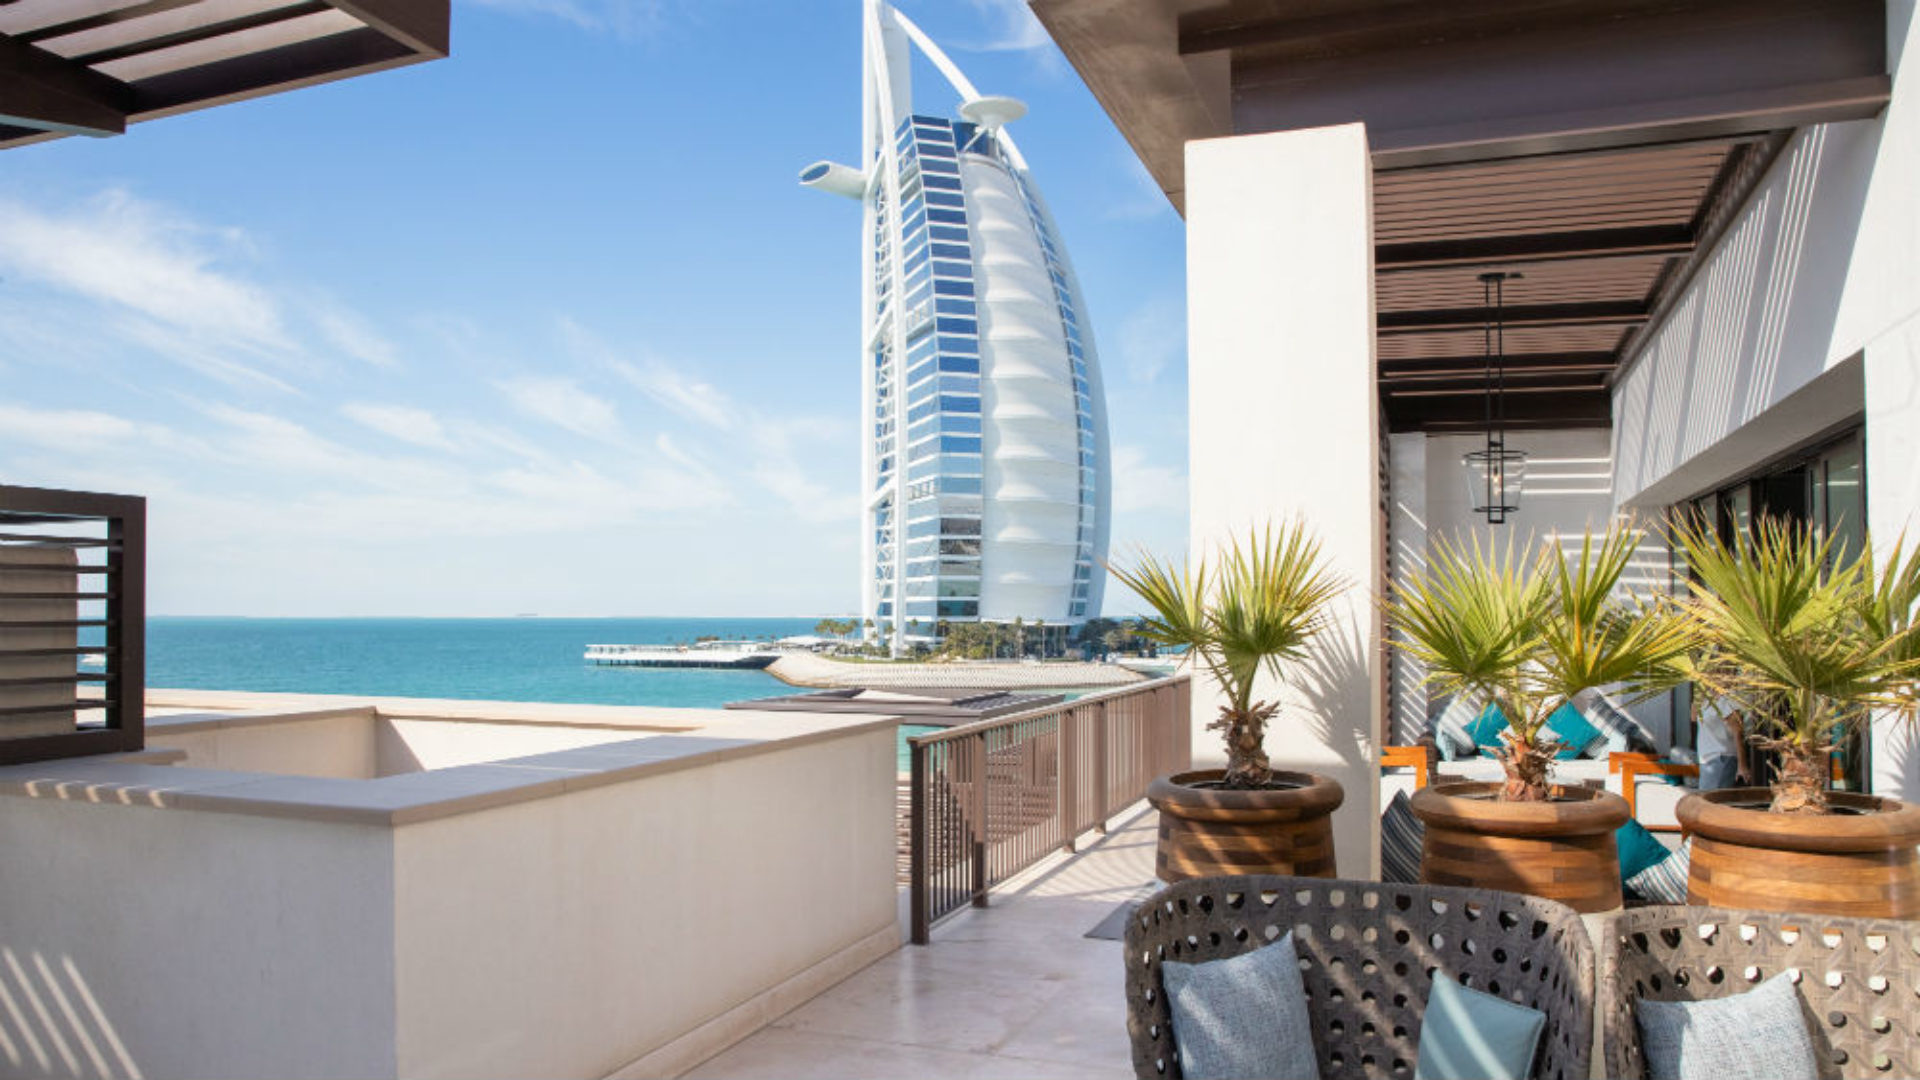 Presidential Suite View at the Jumeirah Al Naseem